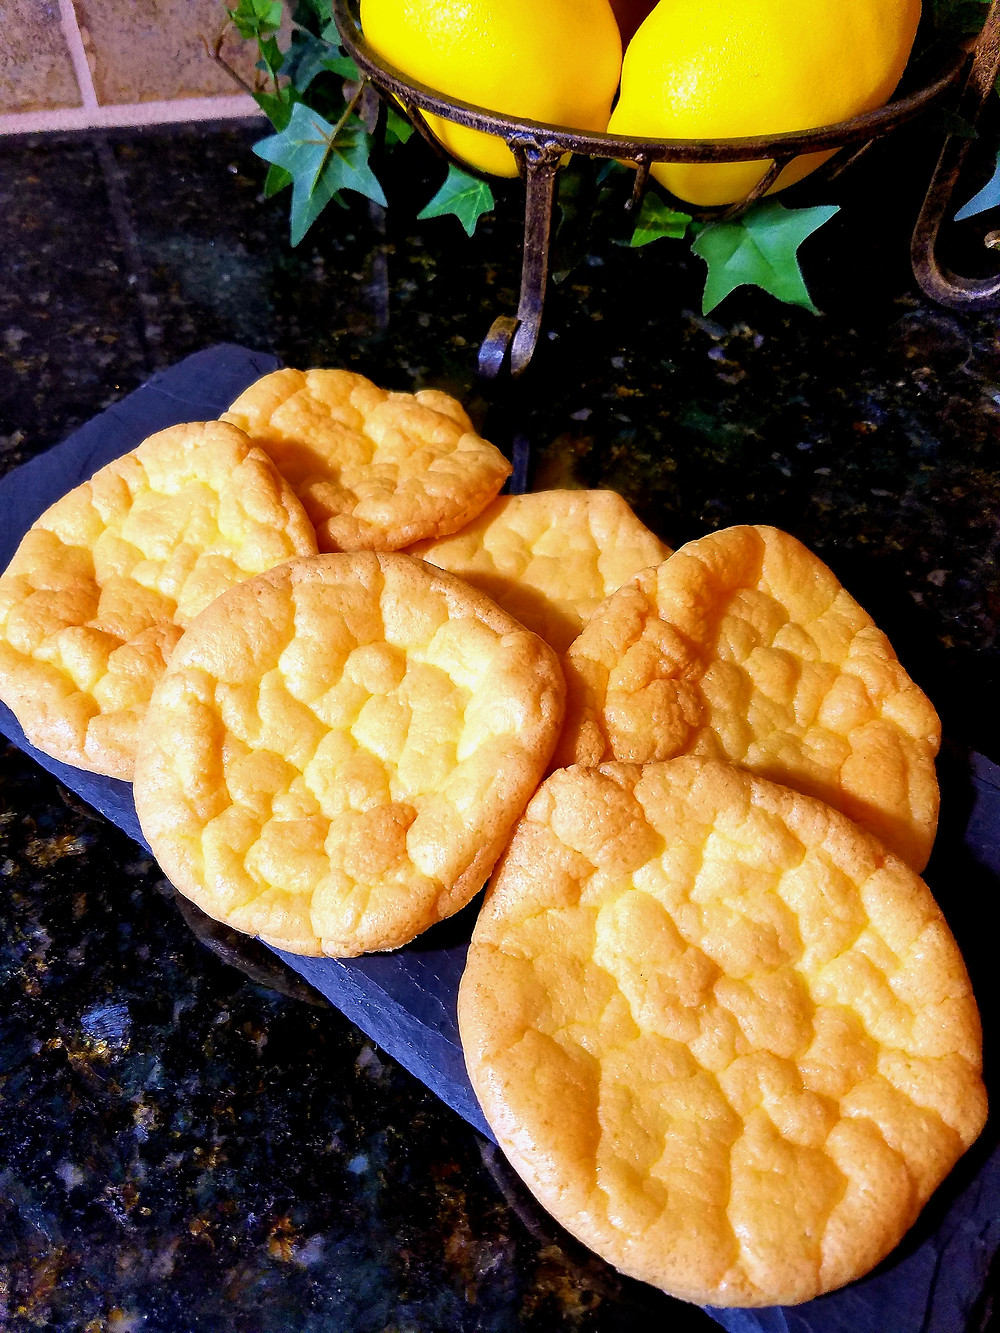 Easy Low-Carb Keto Cloud Bread (Gluten-free, soy-free, dairy-free, grain-free)